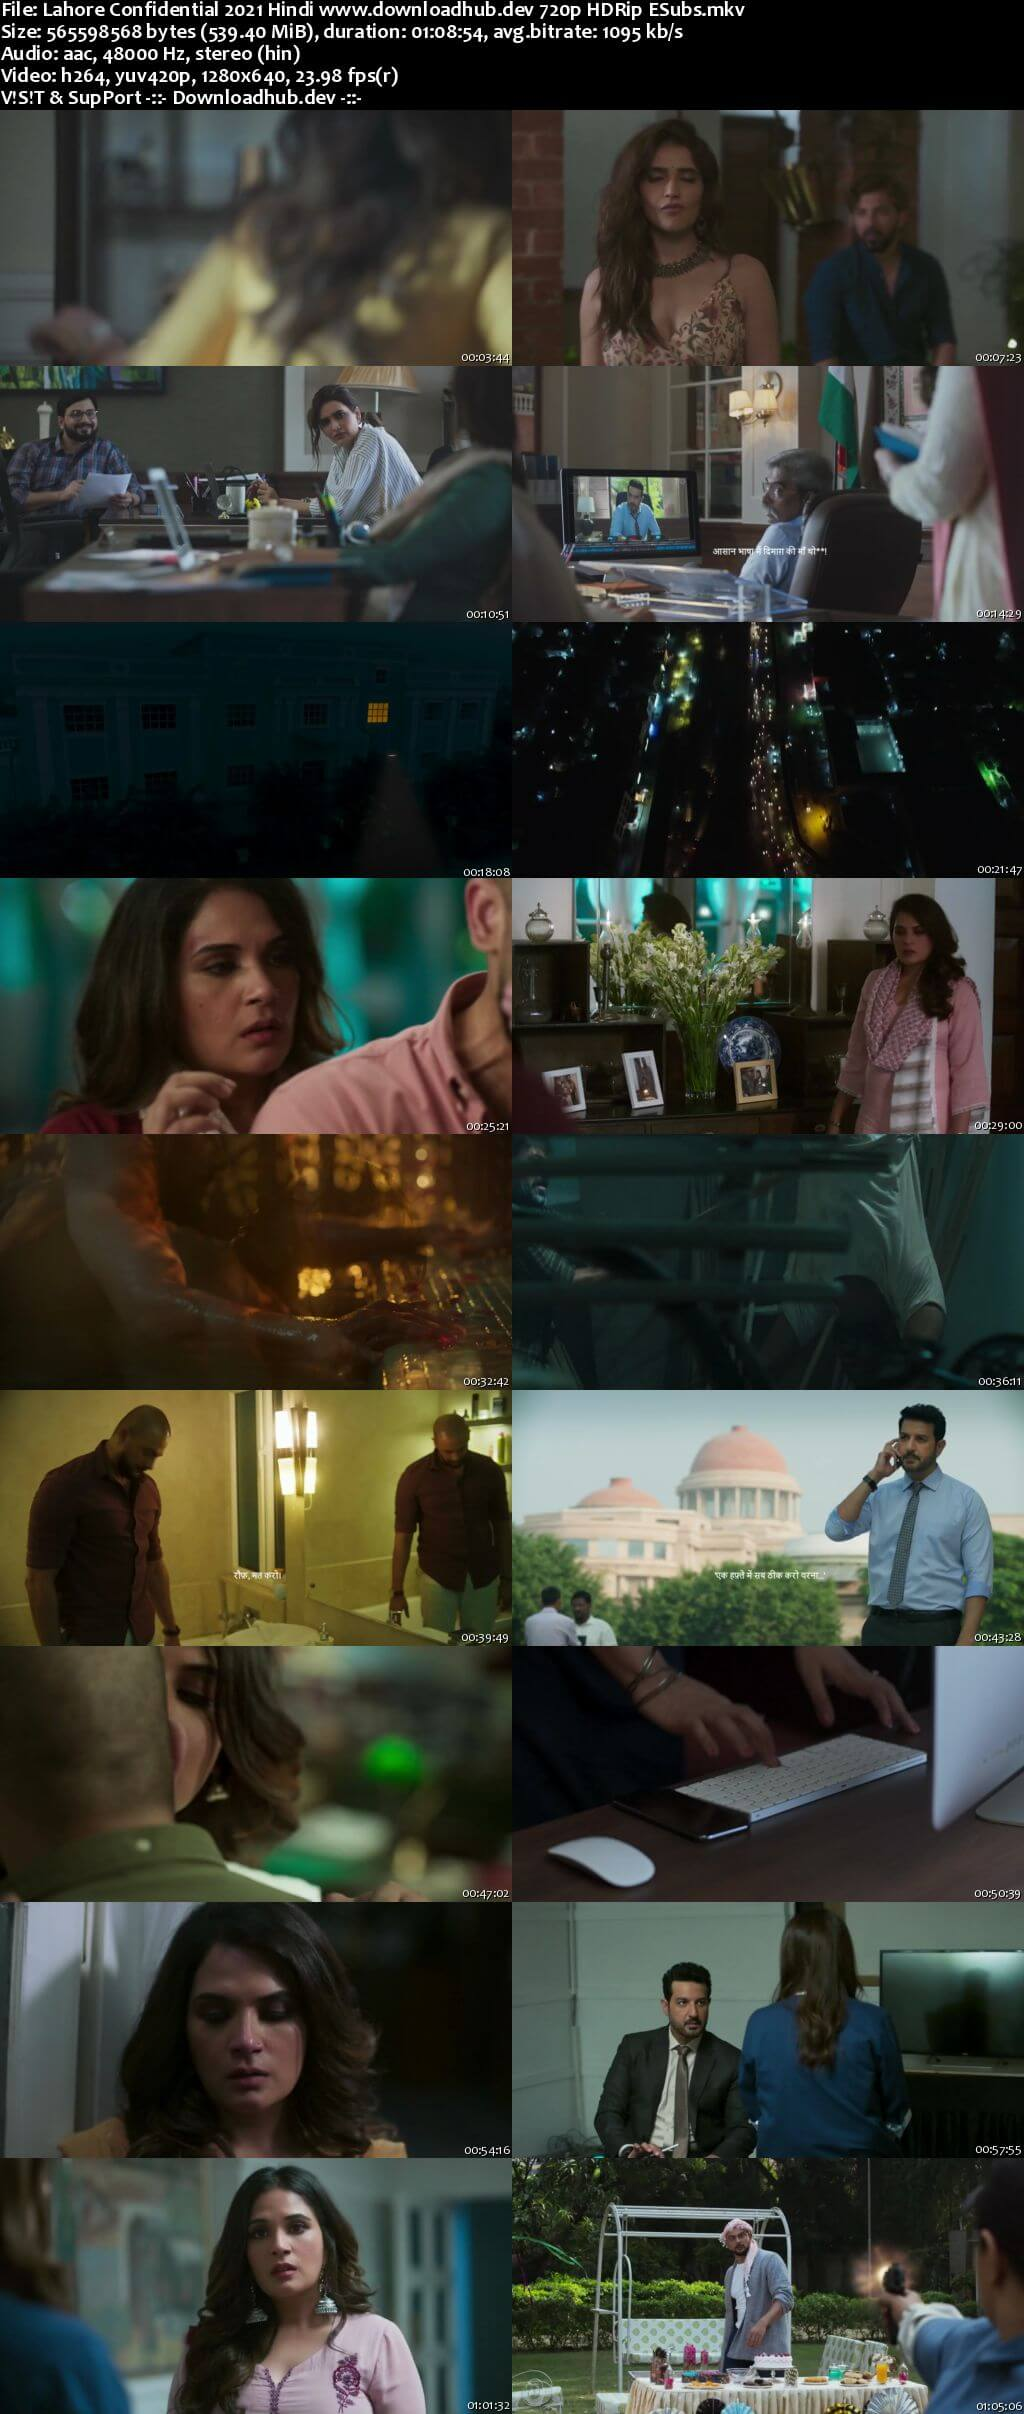 Lahore Confidential 2021 Hindi 720p HDRip ESubs